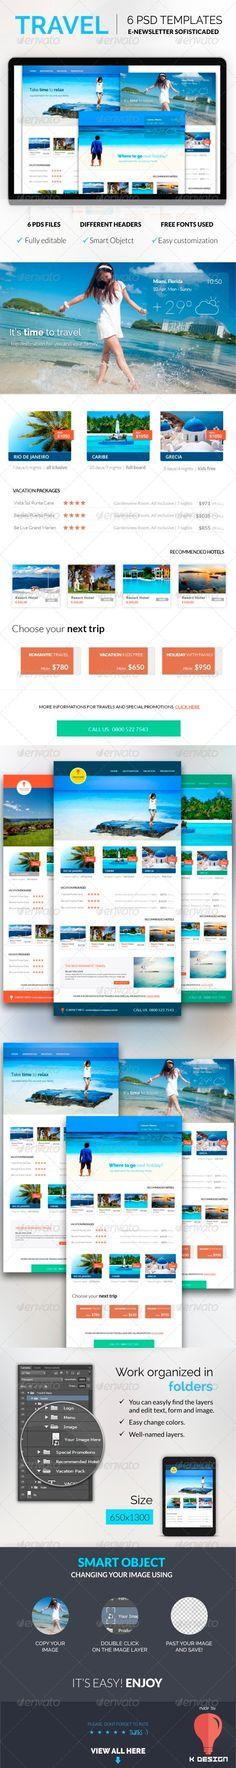 Multipurpose E-newsletter Template Template - email newsletter template